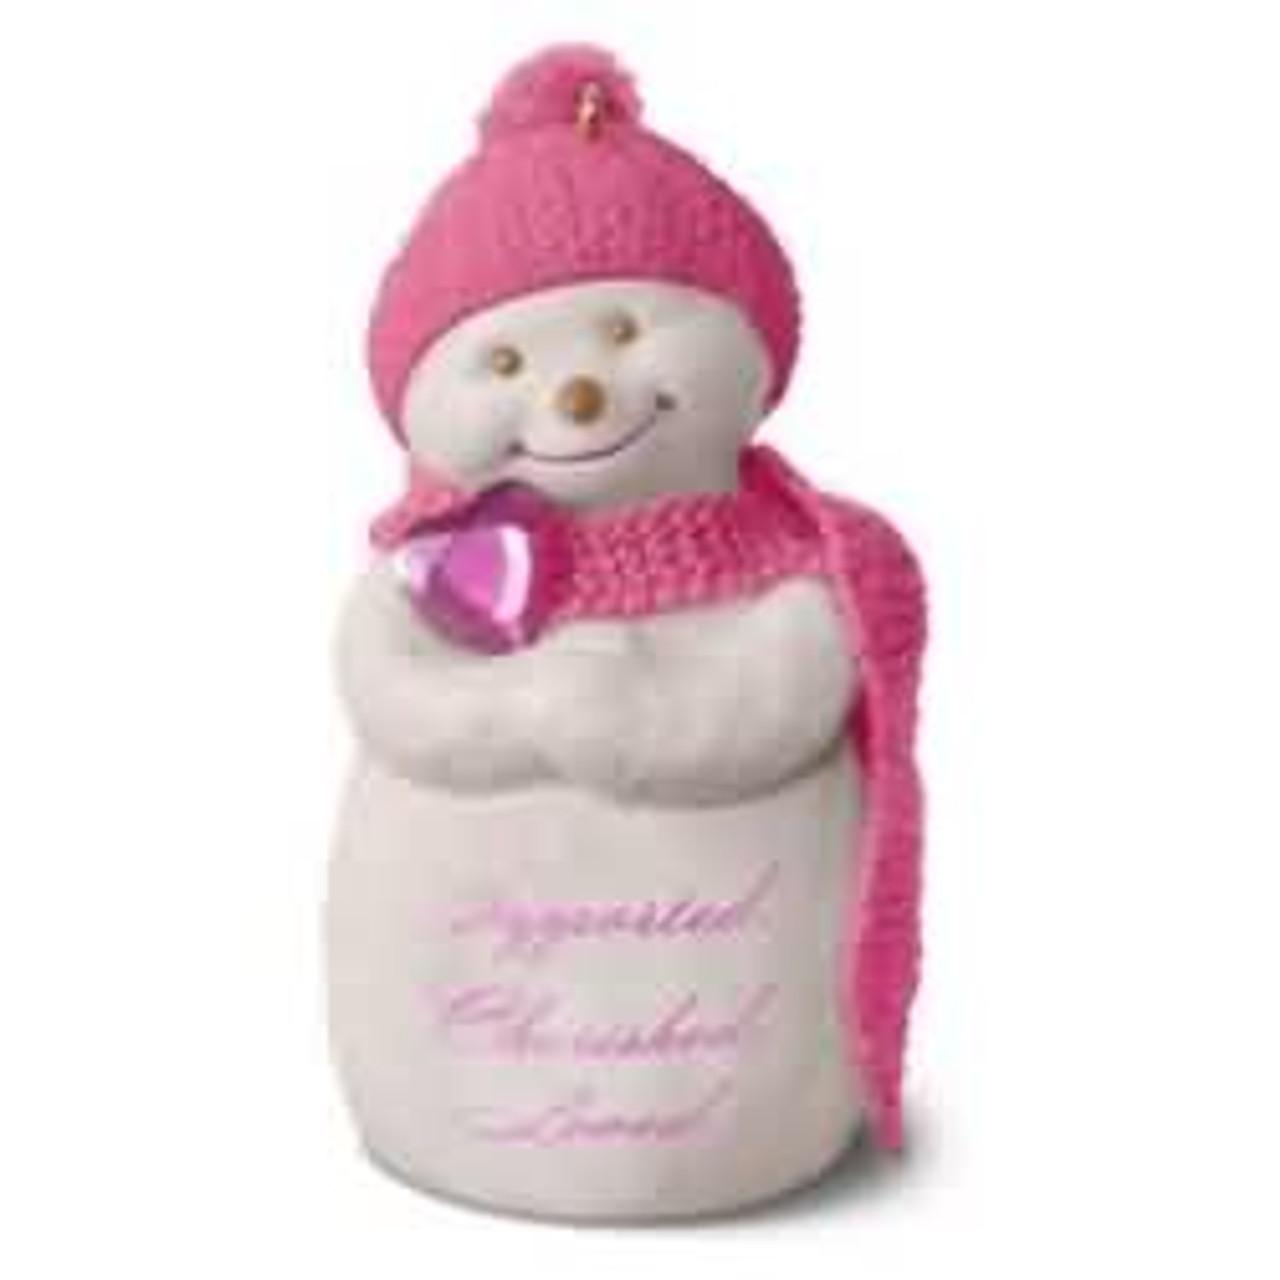 WRAPPED IN LOVE HALLMARK ORNAMENT 2016 NEW SUSAN G KOMEN SNOW LADY PORCELAIN